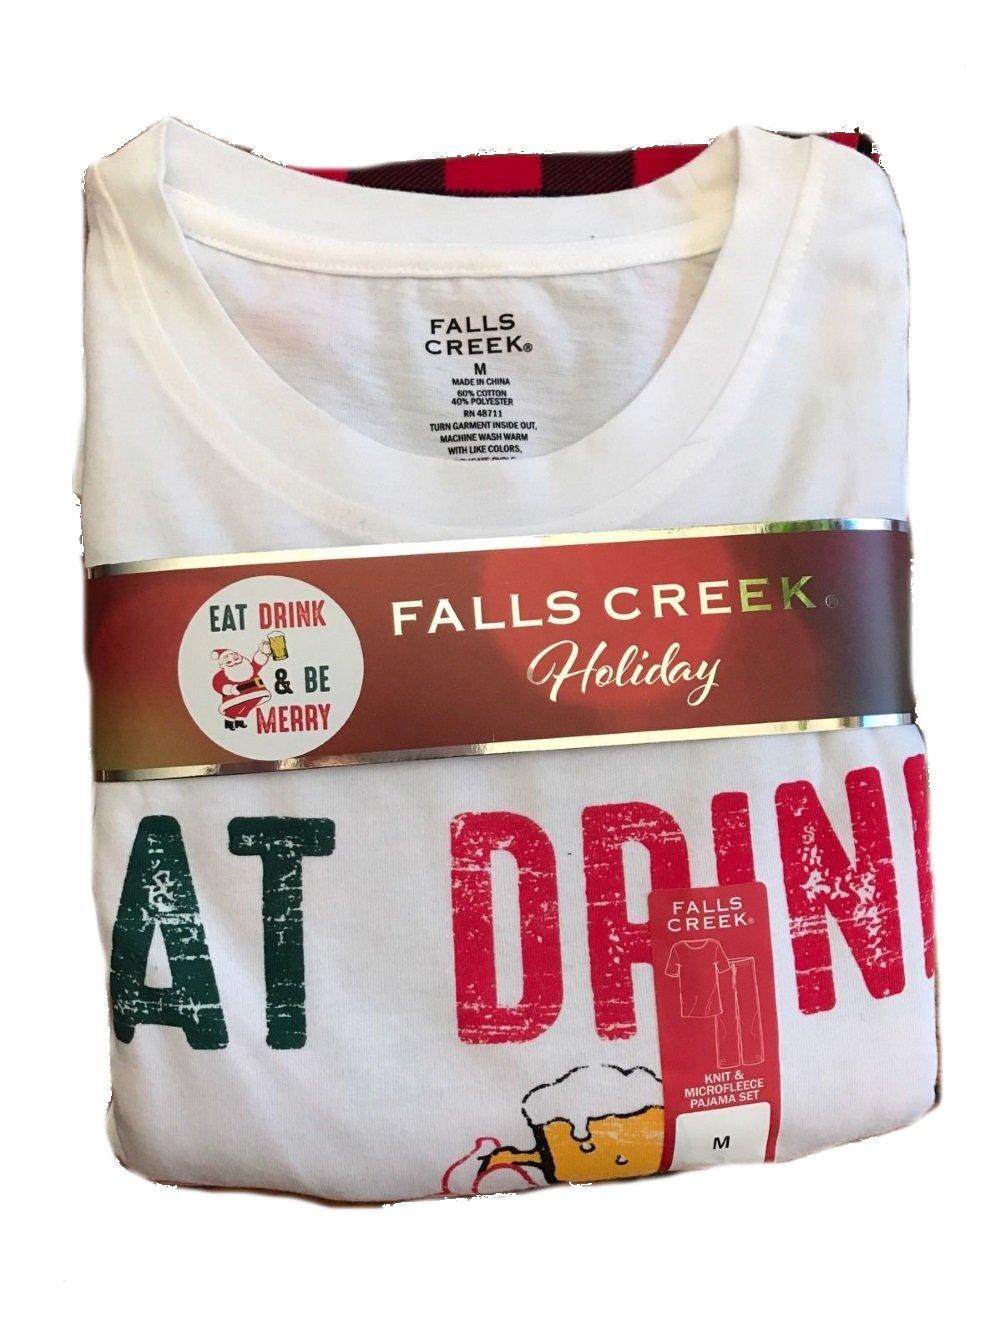 Falls Creek Mens Pajama Set Eat Drink & Be Merry Christmas Buffalo Plaid (Large)